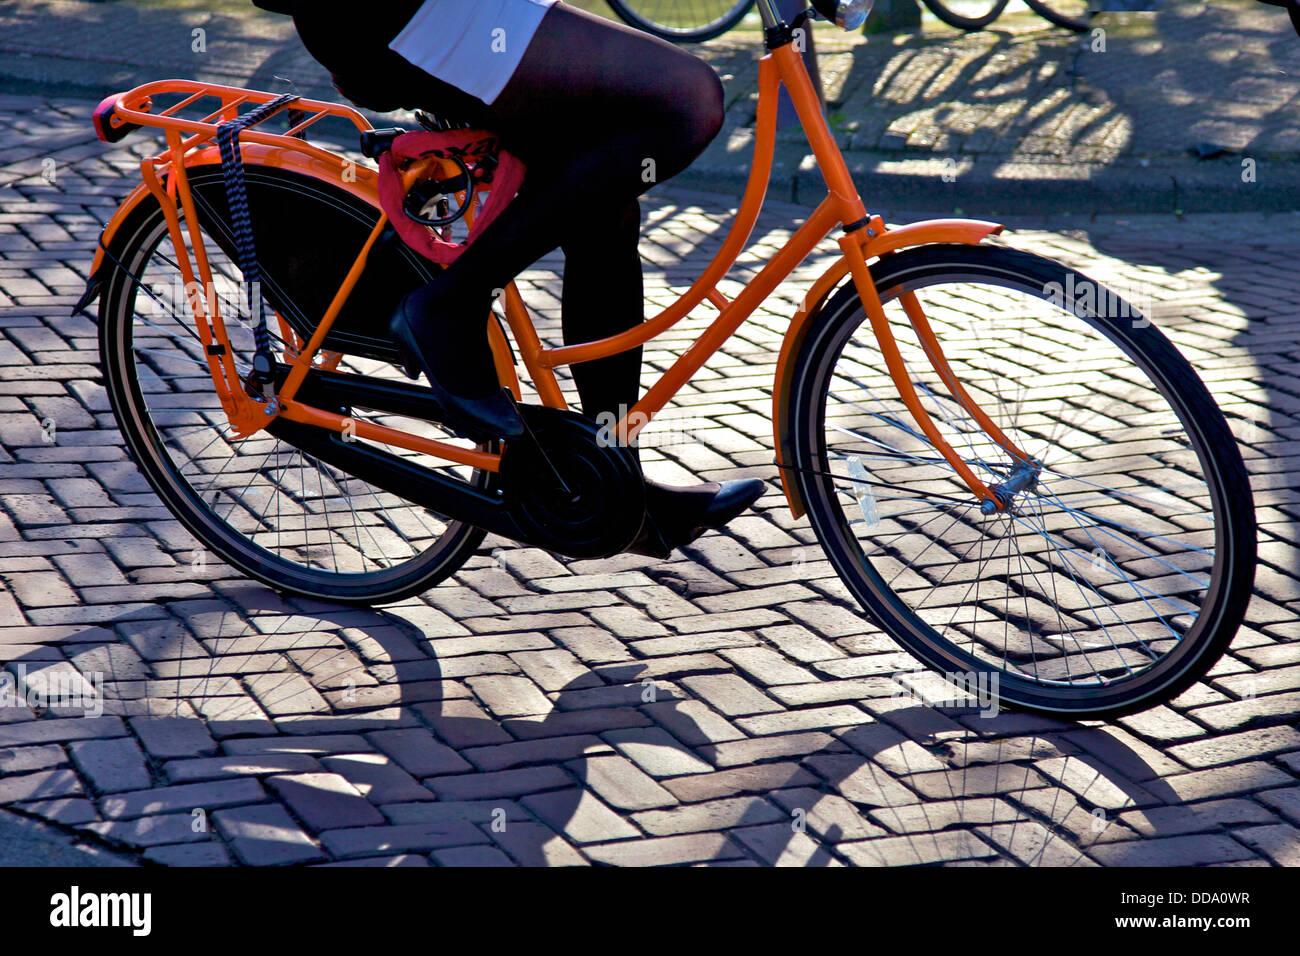 Cyclist, Amsterdam, Netherlands, Europe - Stock Image